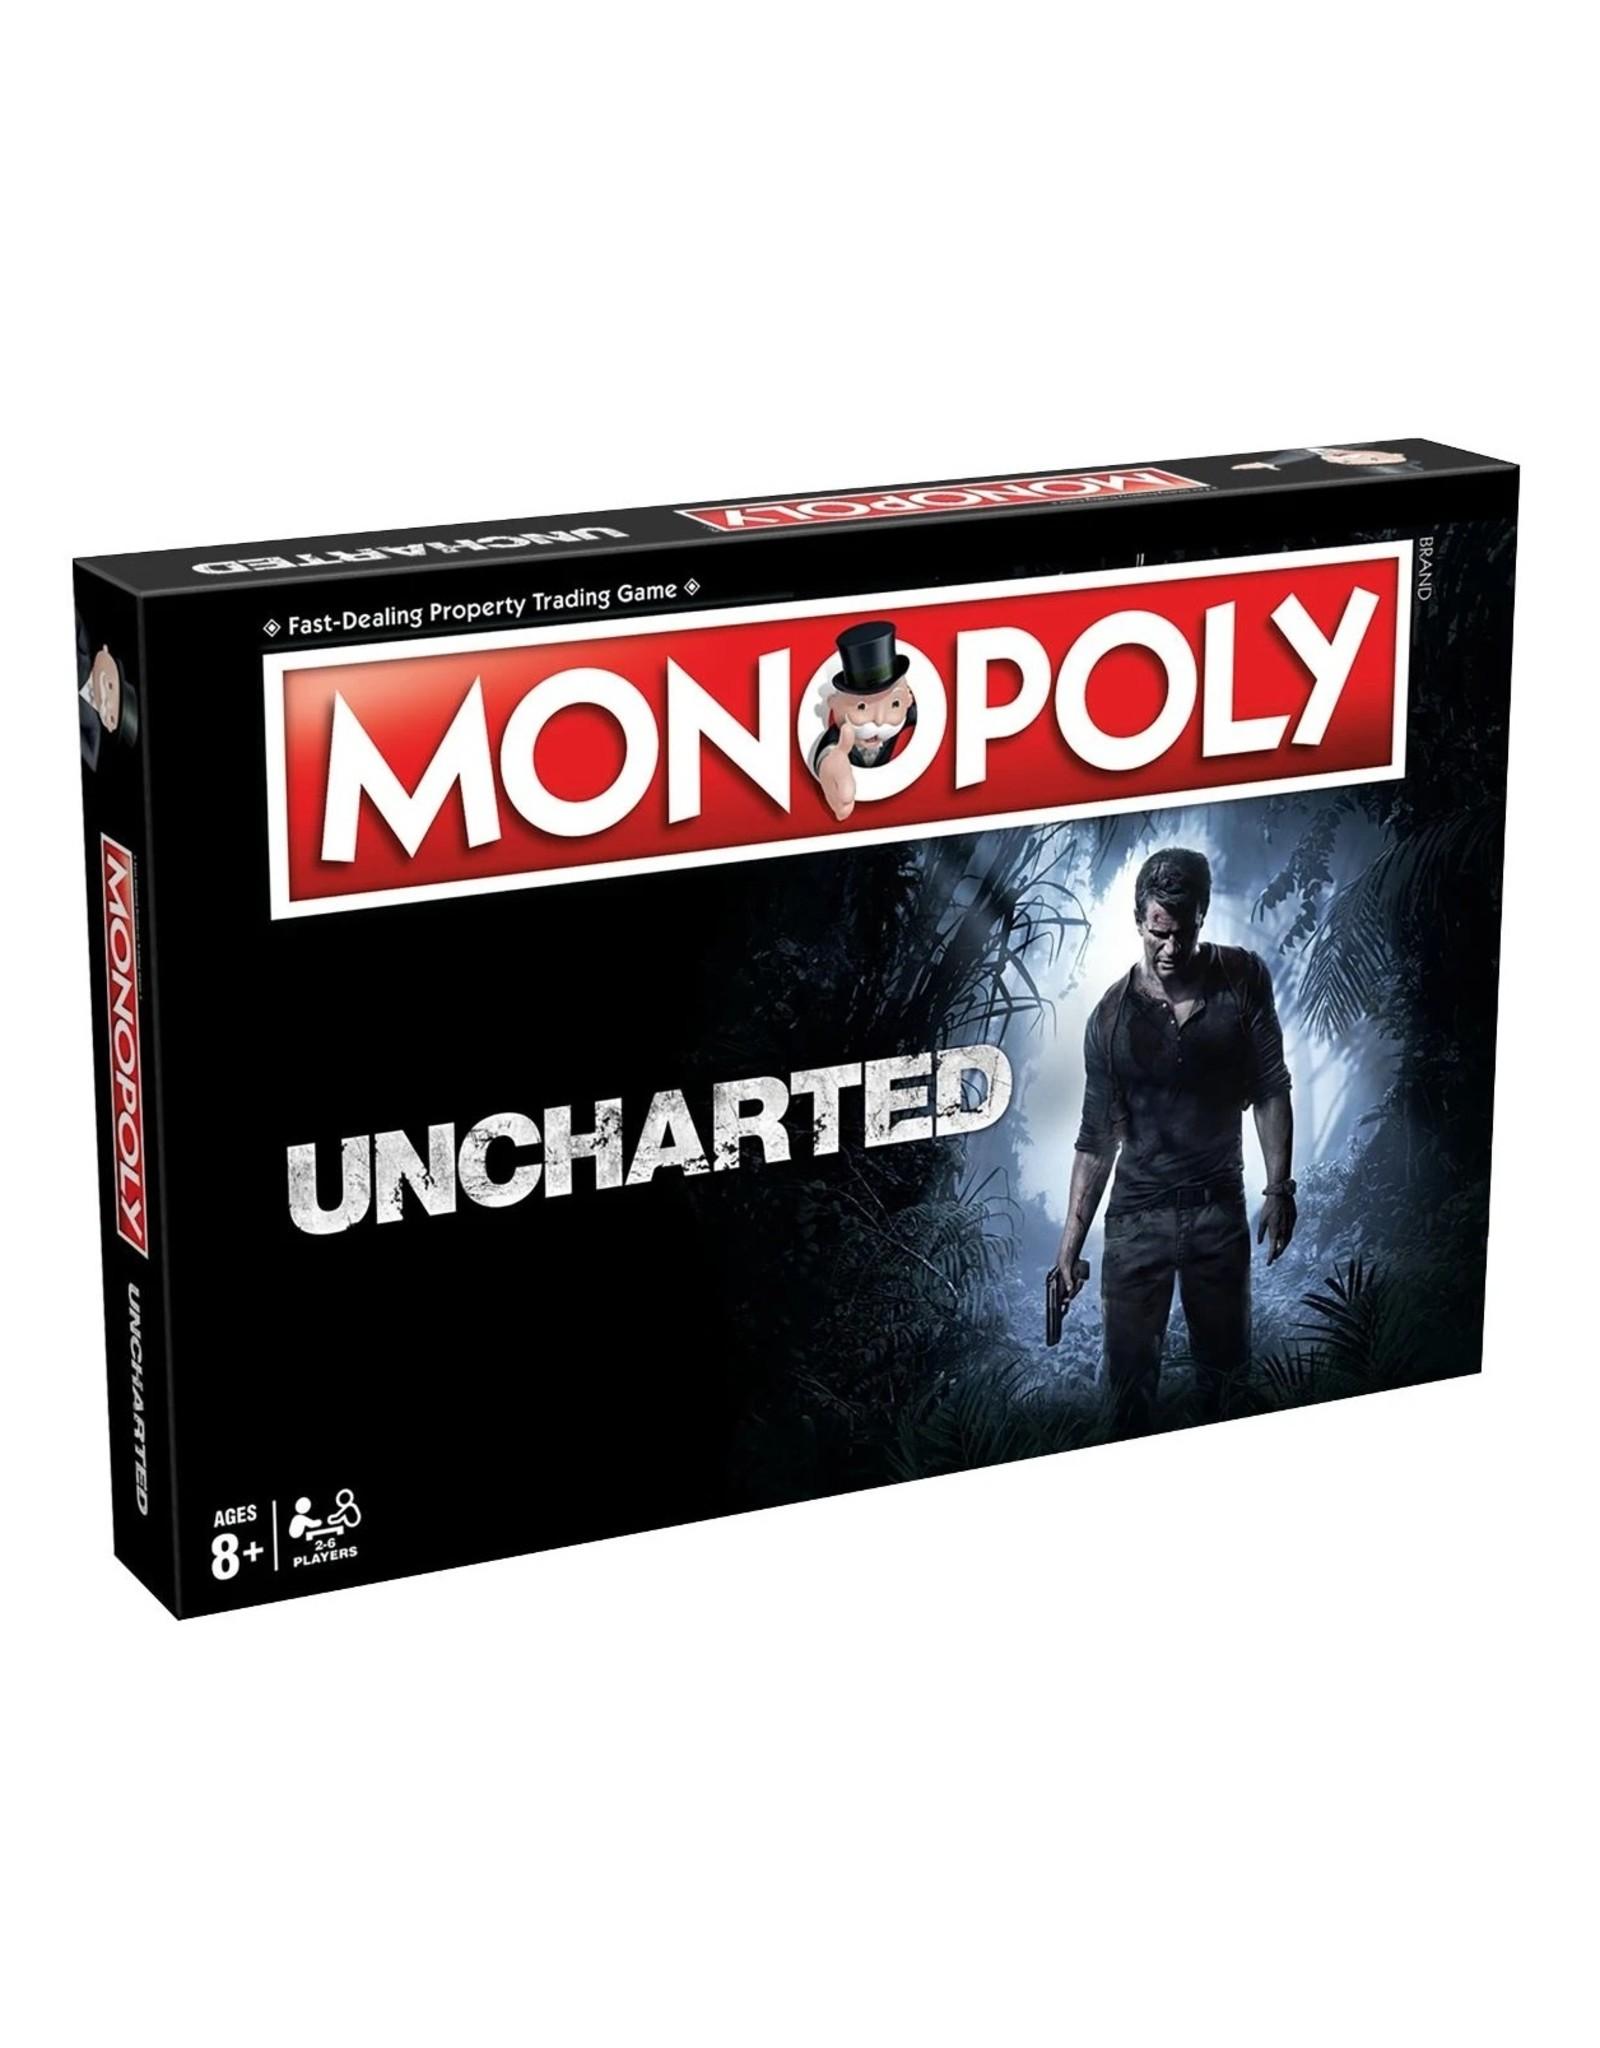 Monopoly Monopoly - Uncharted - Bordspel - Engelstalige Versie